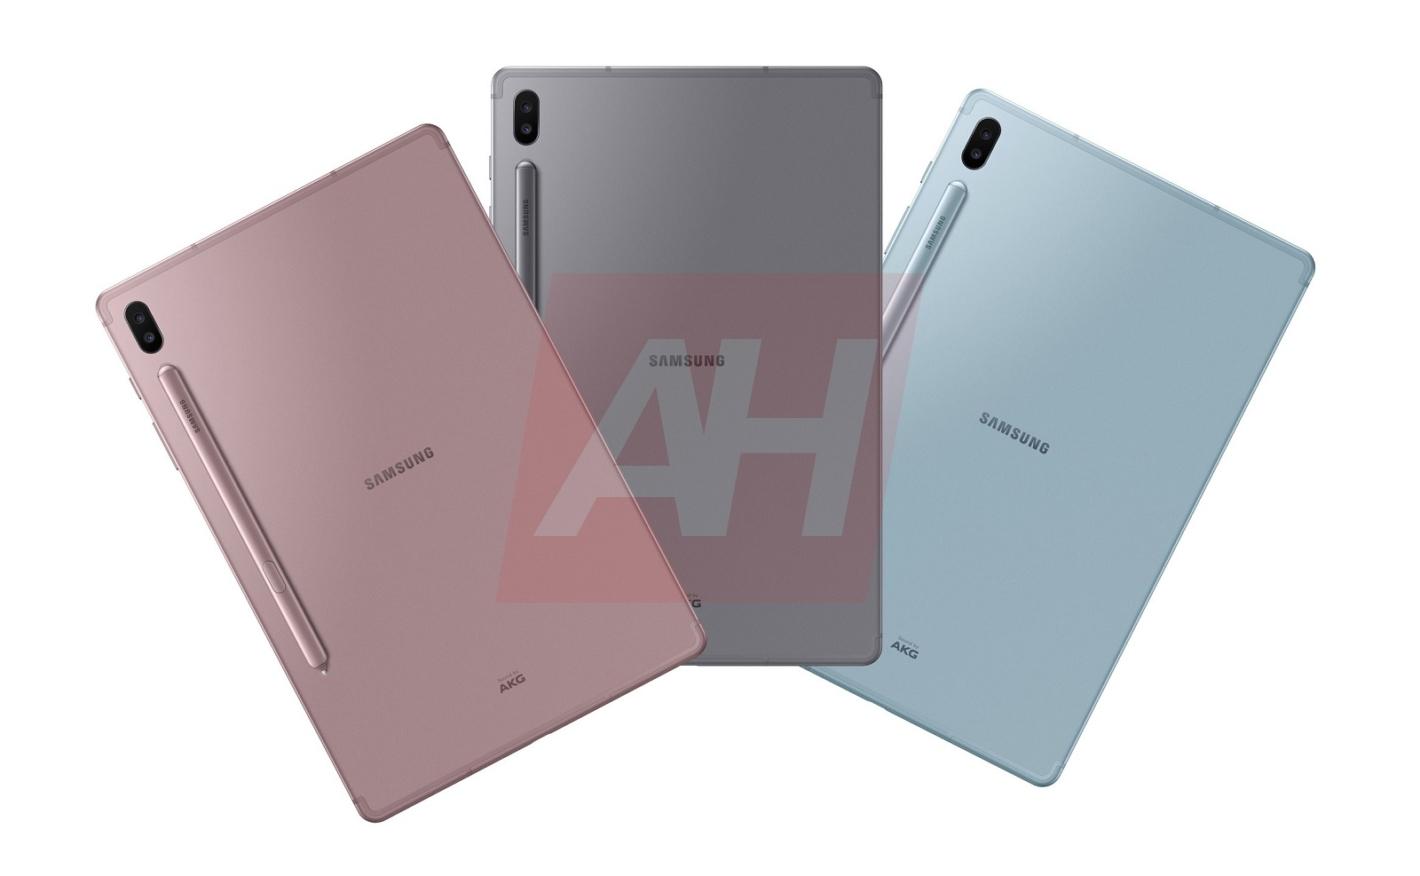 Samsung-Galaxy-Tab-S6-Leak-All-Colors-AH-1420x876.jpg